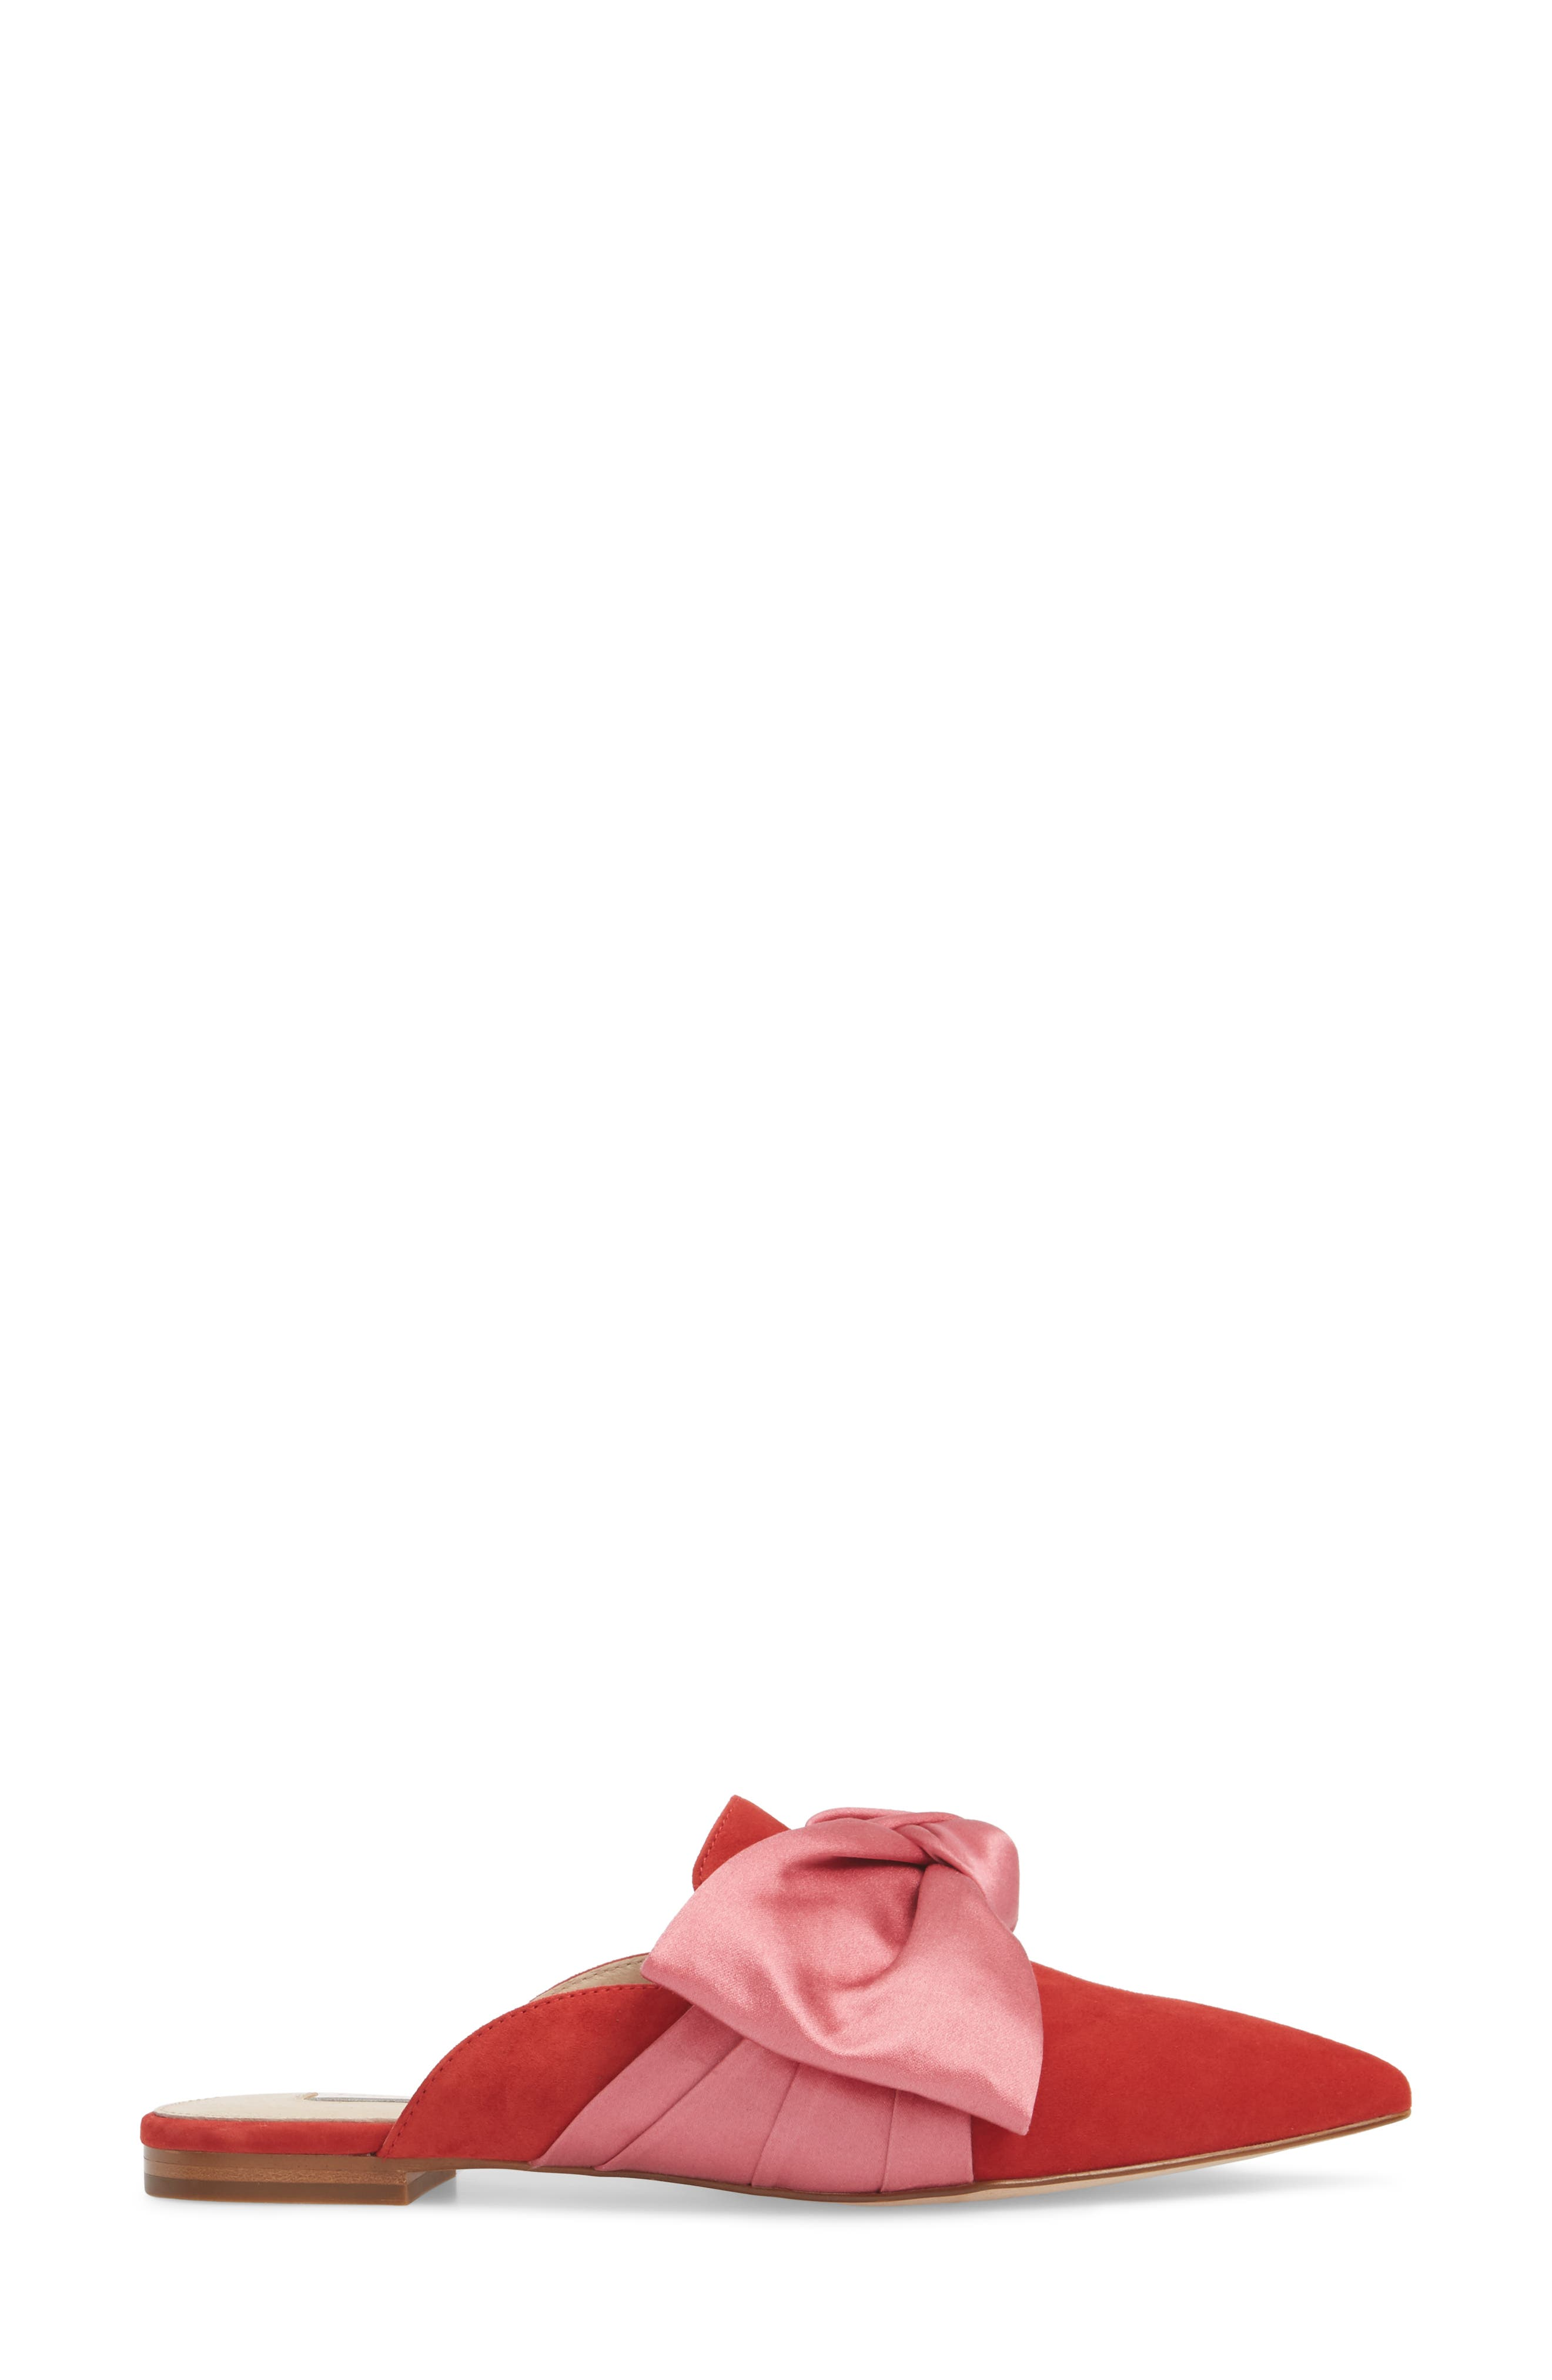 Cela Bow Mule,                             Alternate thumbnail 3, color,                             ACE MOXIE PINK SUEDE